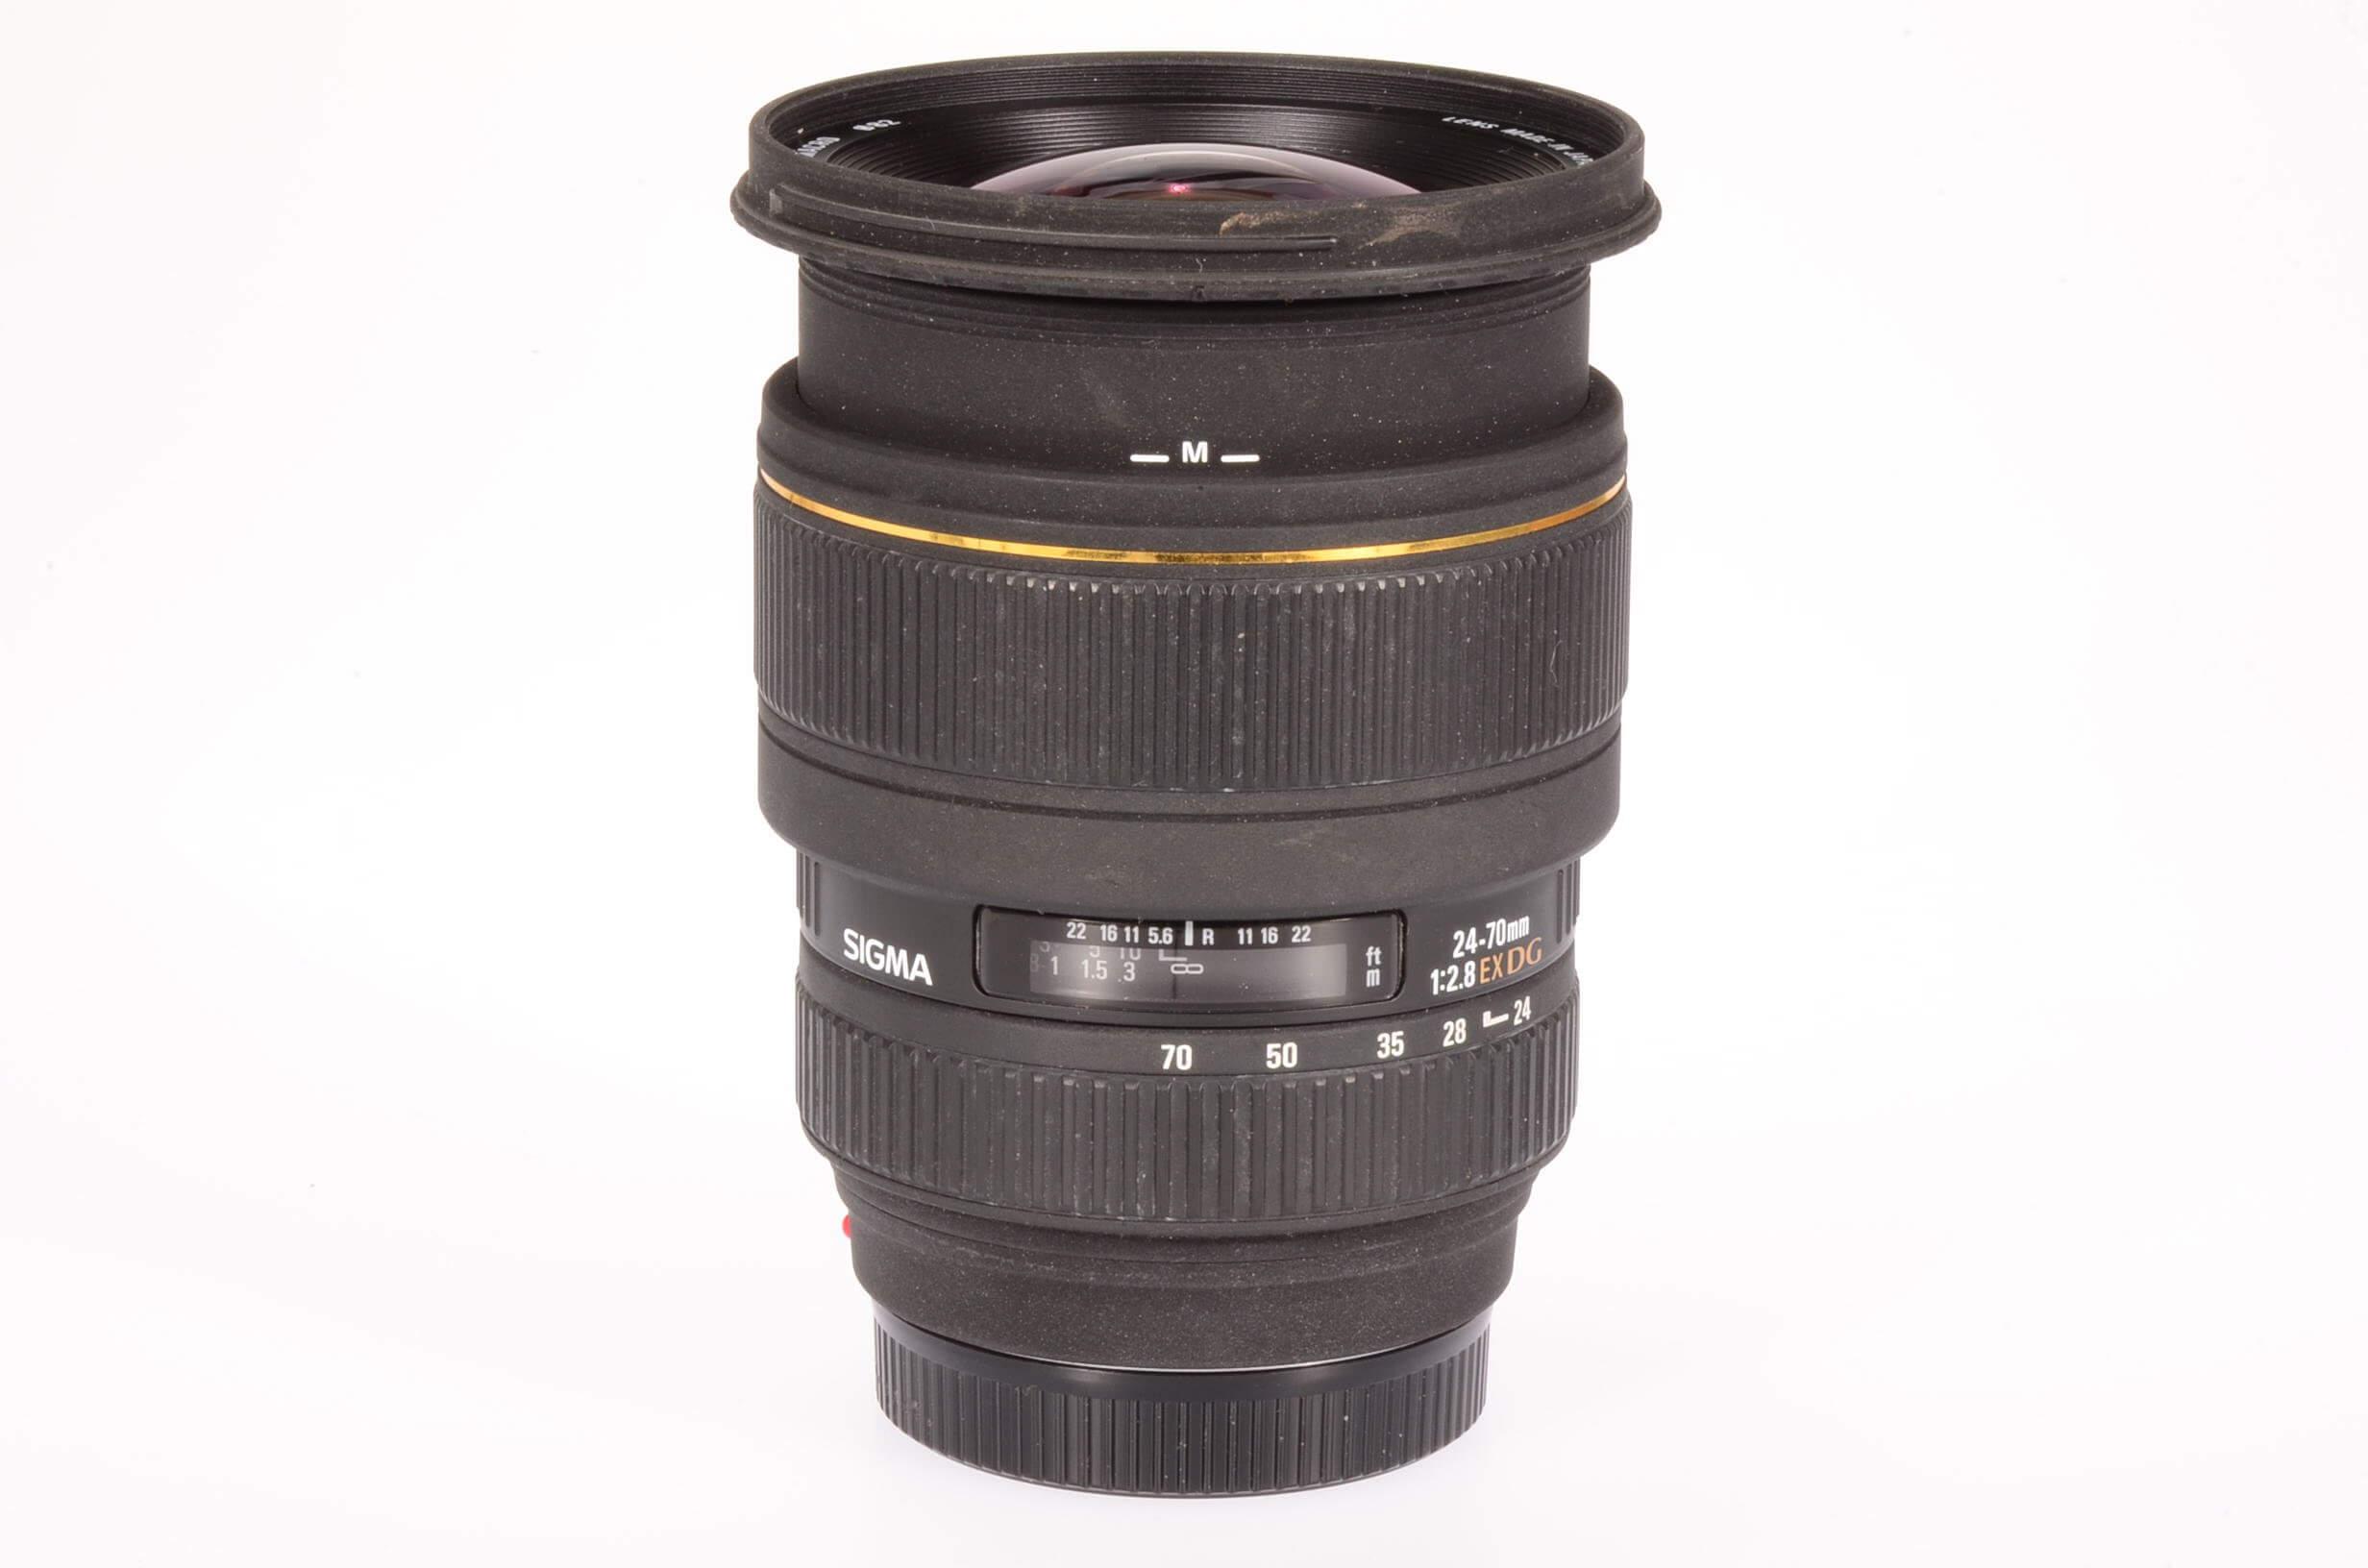 Sigma 24-70mm f2.8 EX DG lens, Sony/Minolta mount